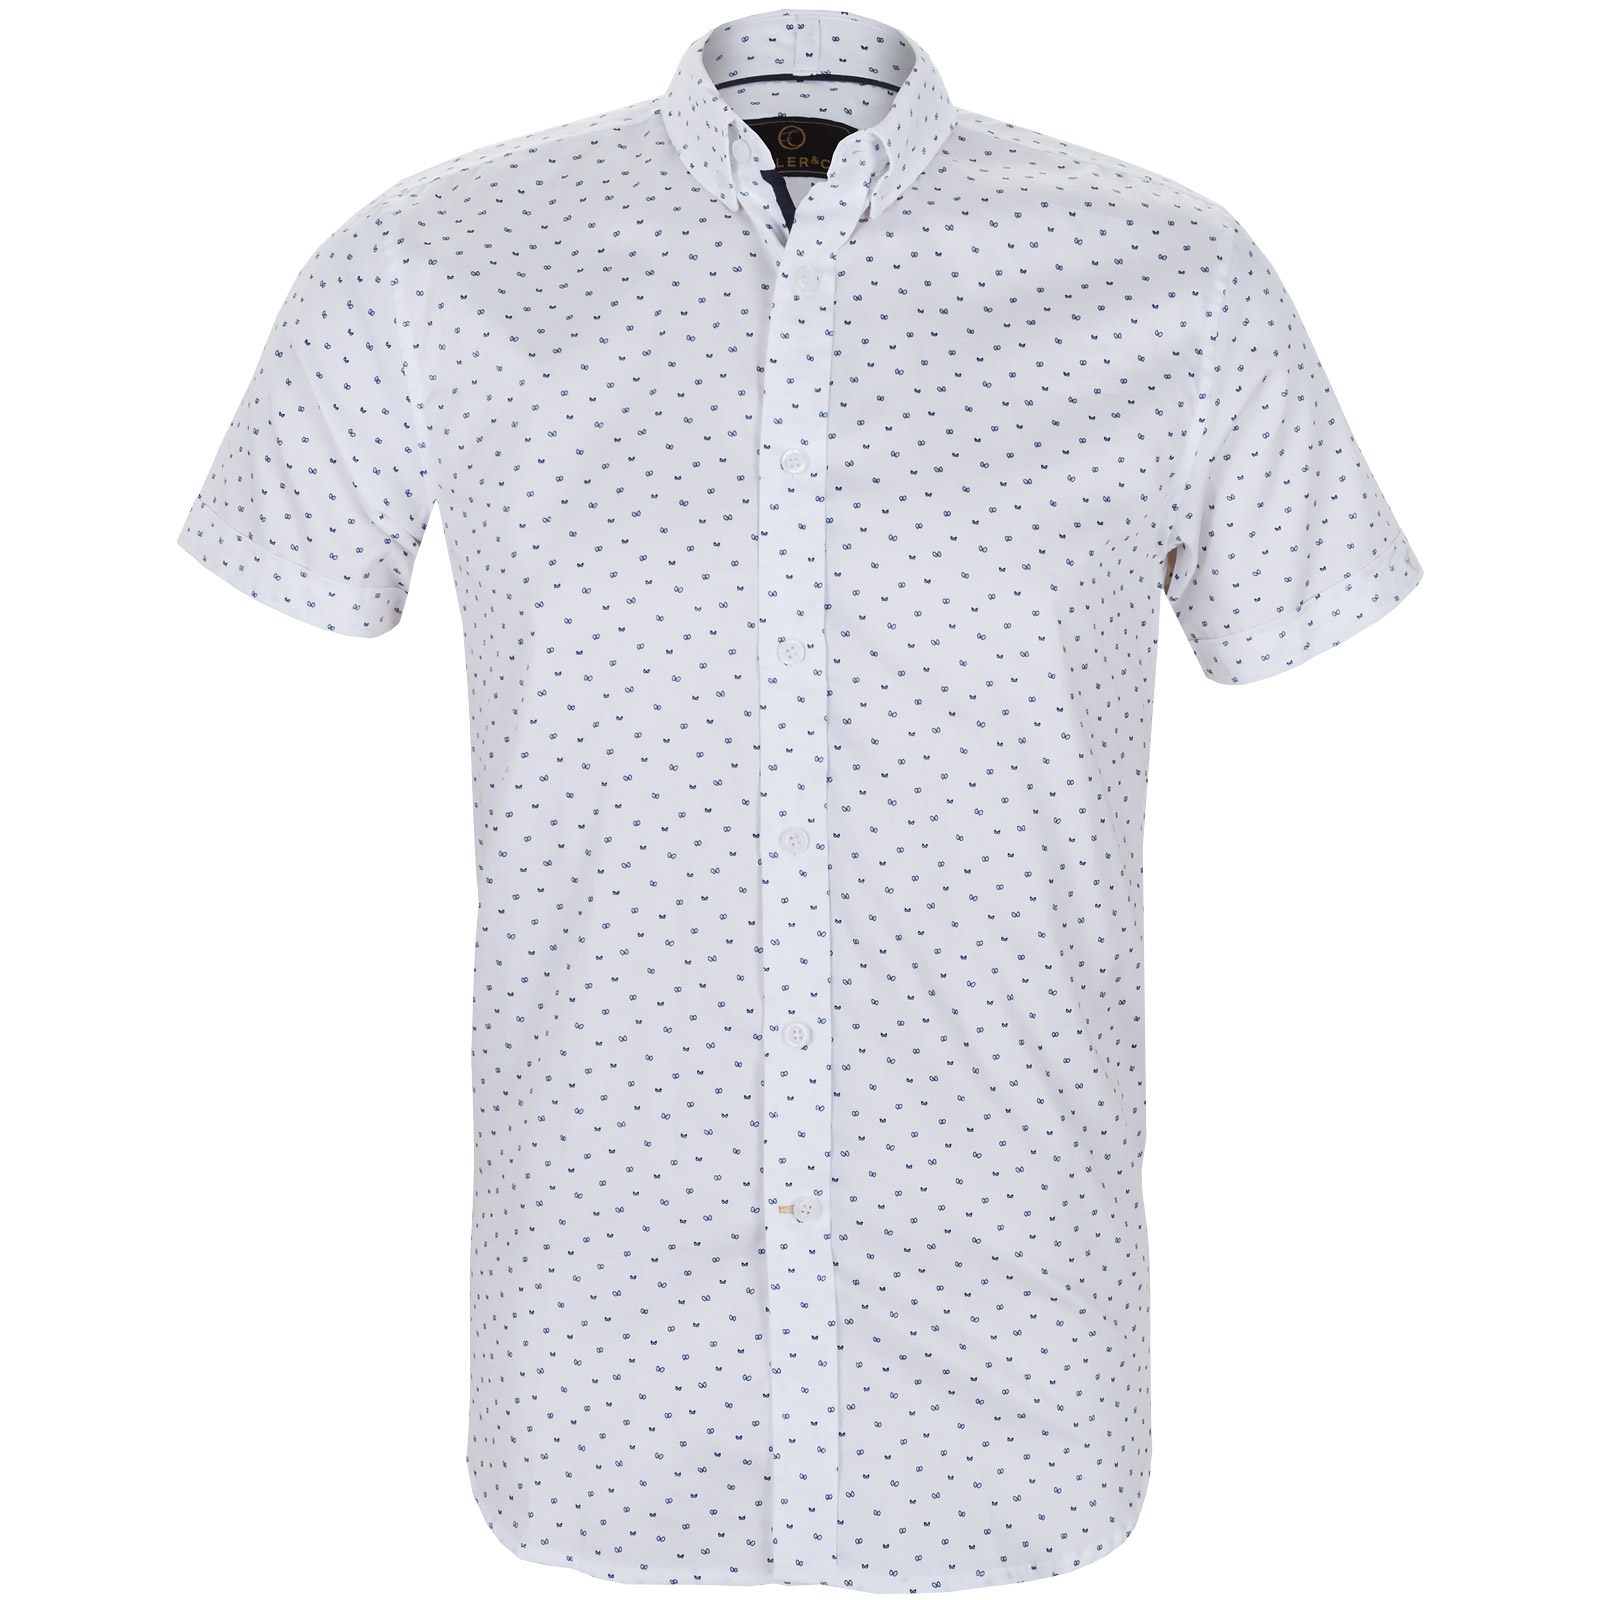 Victor Night Eyes Print Casual Cotton Shirt Shirts Casual Fifth